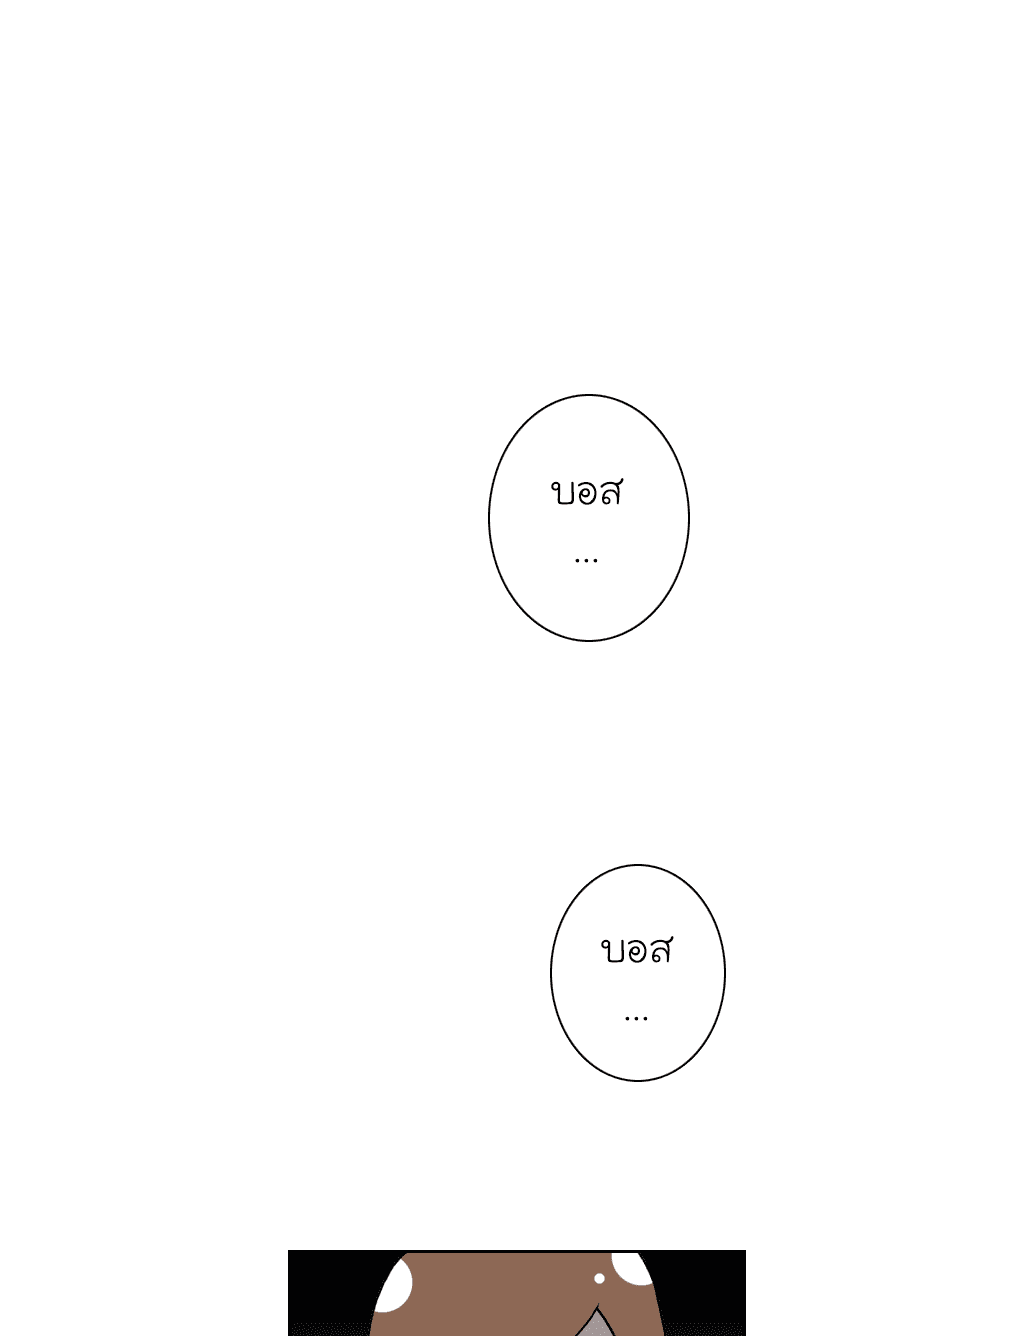 Page 38 - ไม่เก่ง